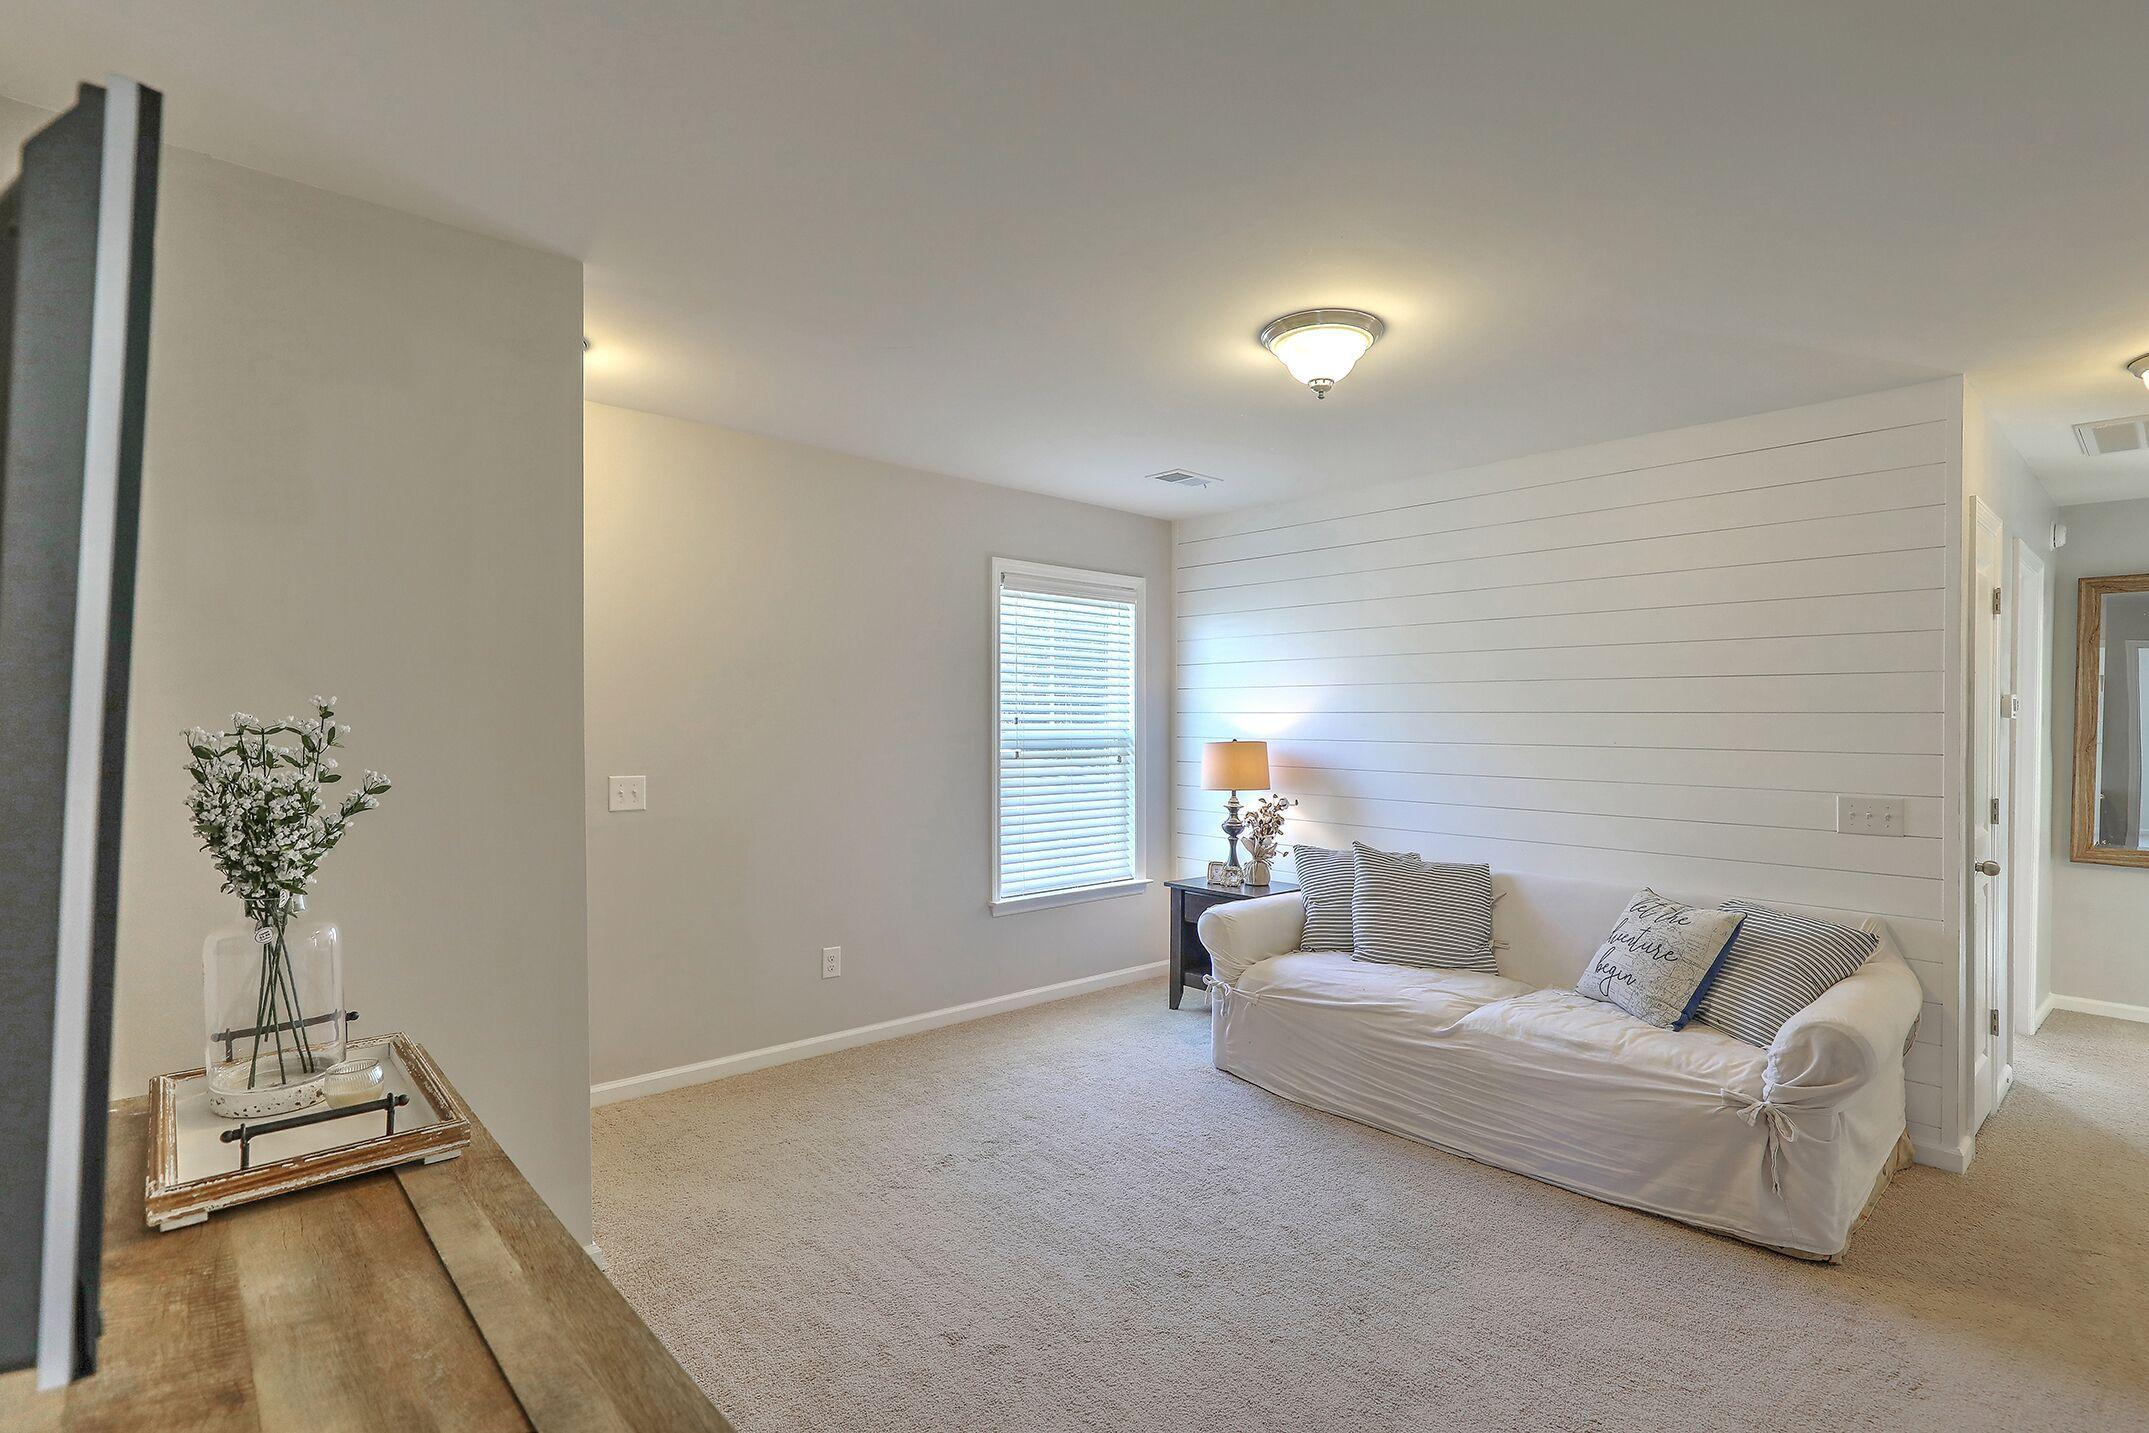 Copahee Landing Homes For Sale - 3731 Copahee Sound, Mount Pleasant, SC - 19